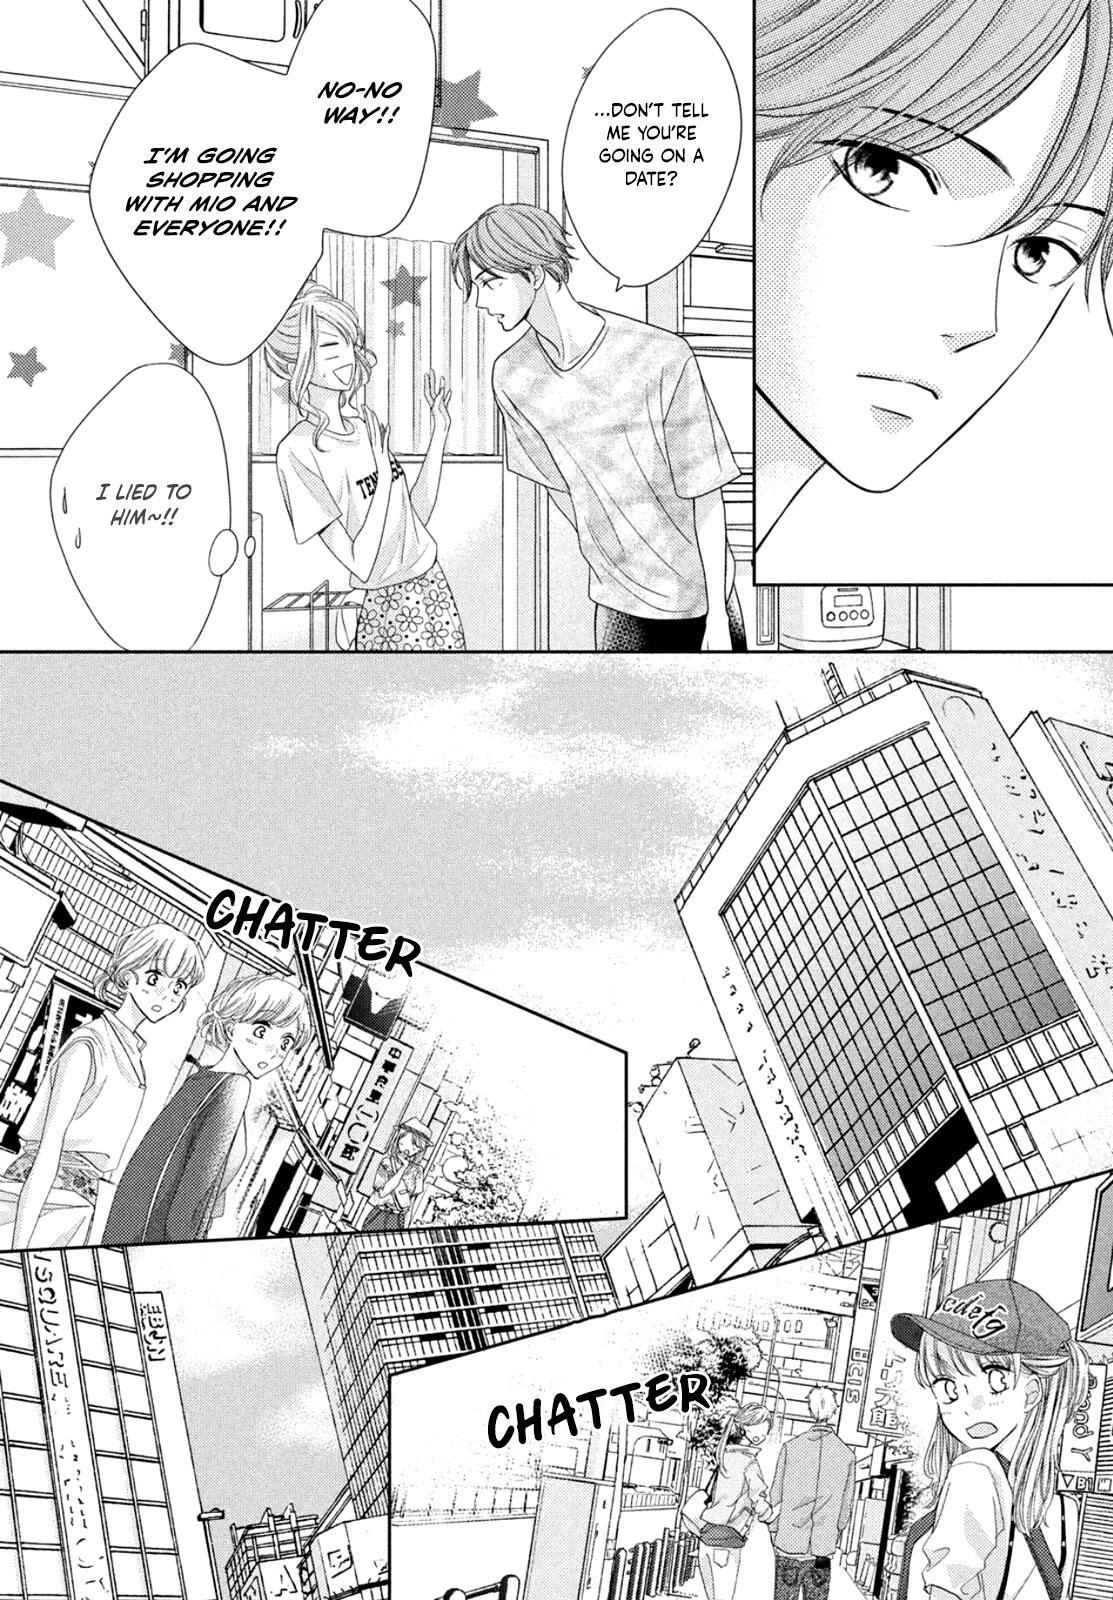 Arashi-Kun No Dakimakura Chapter 7: Because We're The Same page 10 - Mangakakalots.com